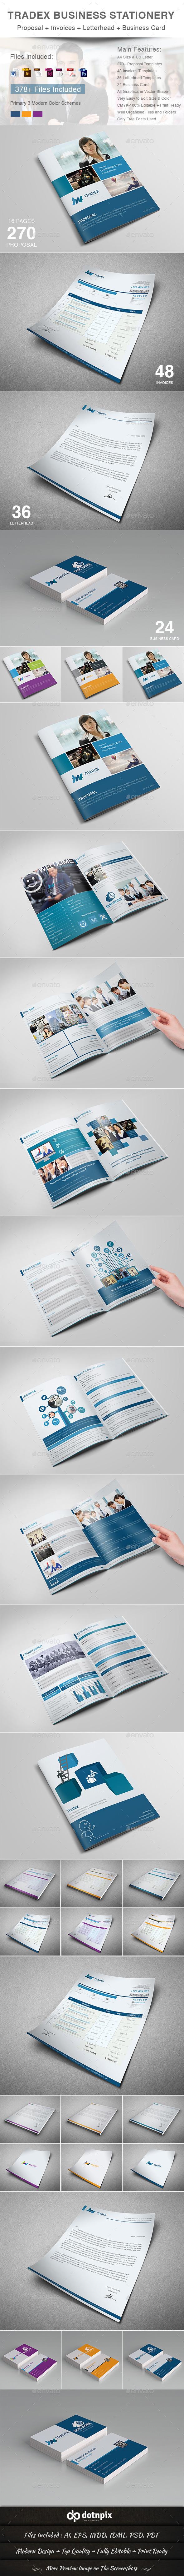 GraphicRiver Tradex Business Stationery 10870621